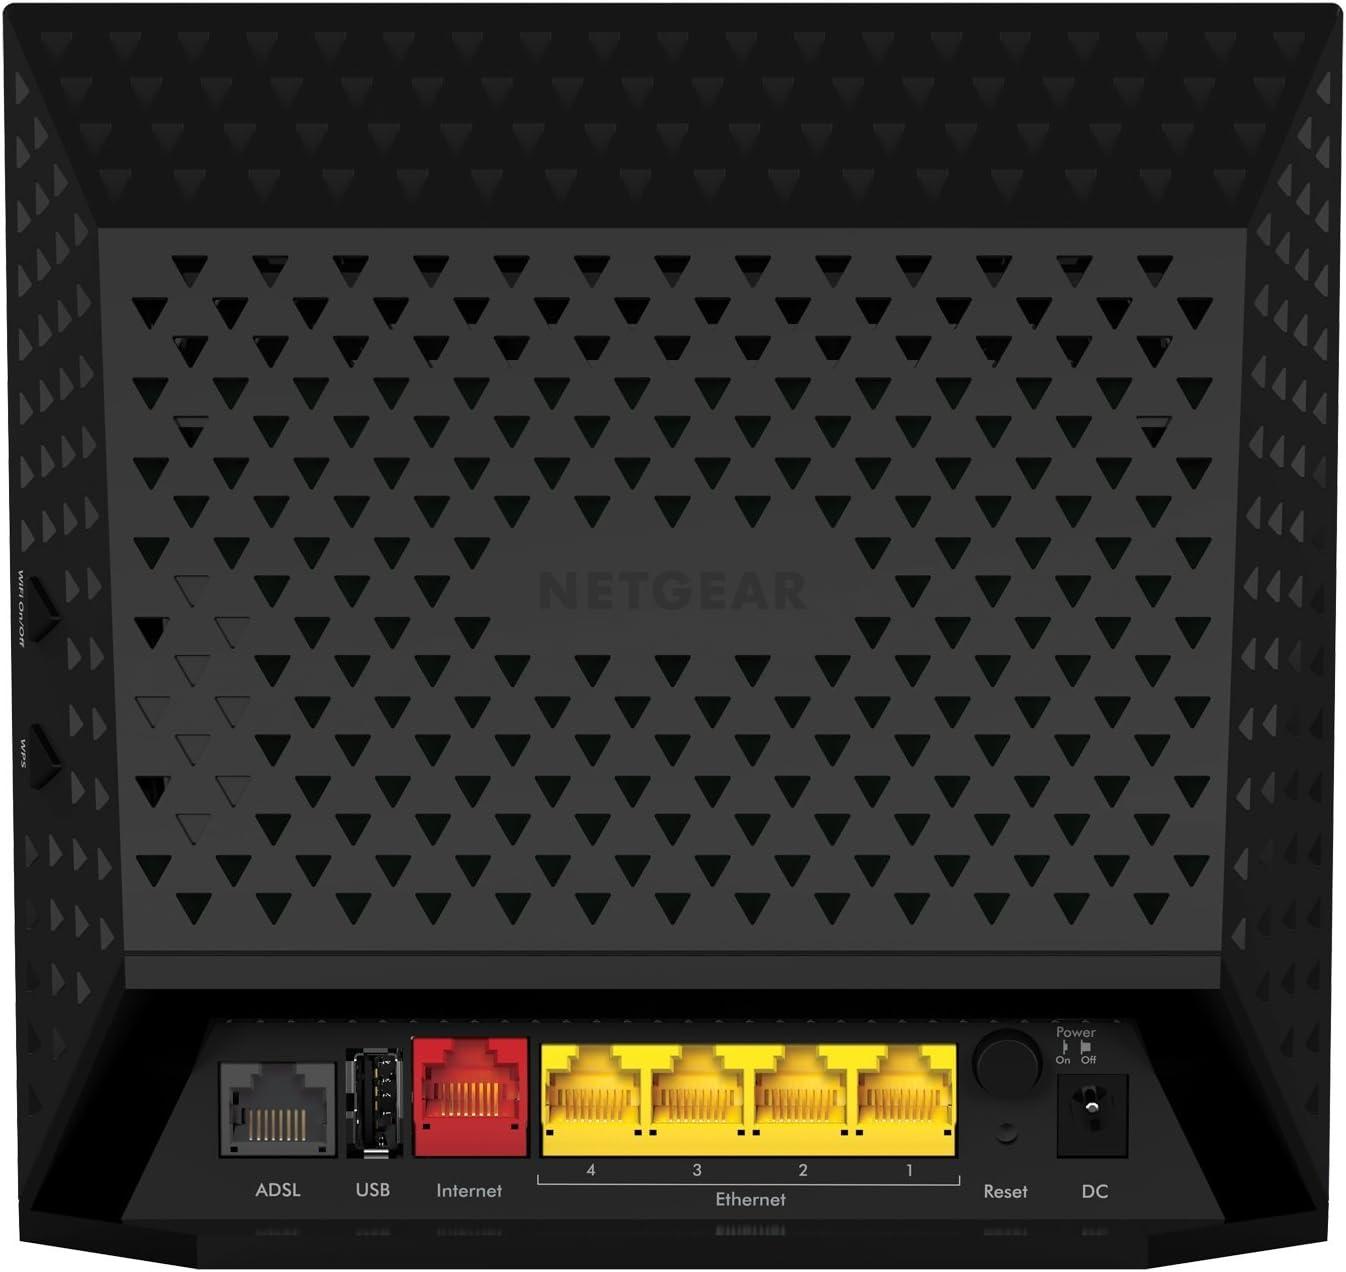 Netgear D6200 100pes Ac Modem Router Annex A Annex J Computer Zubehör